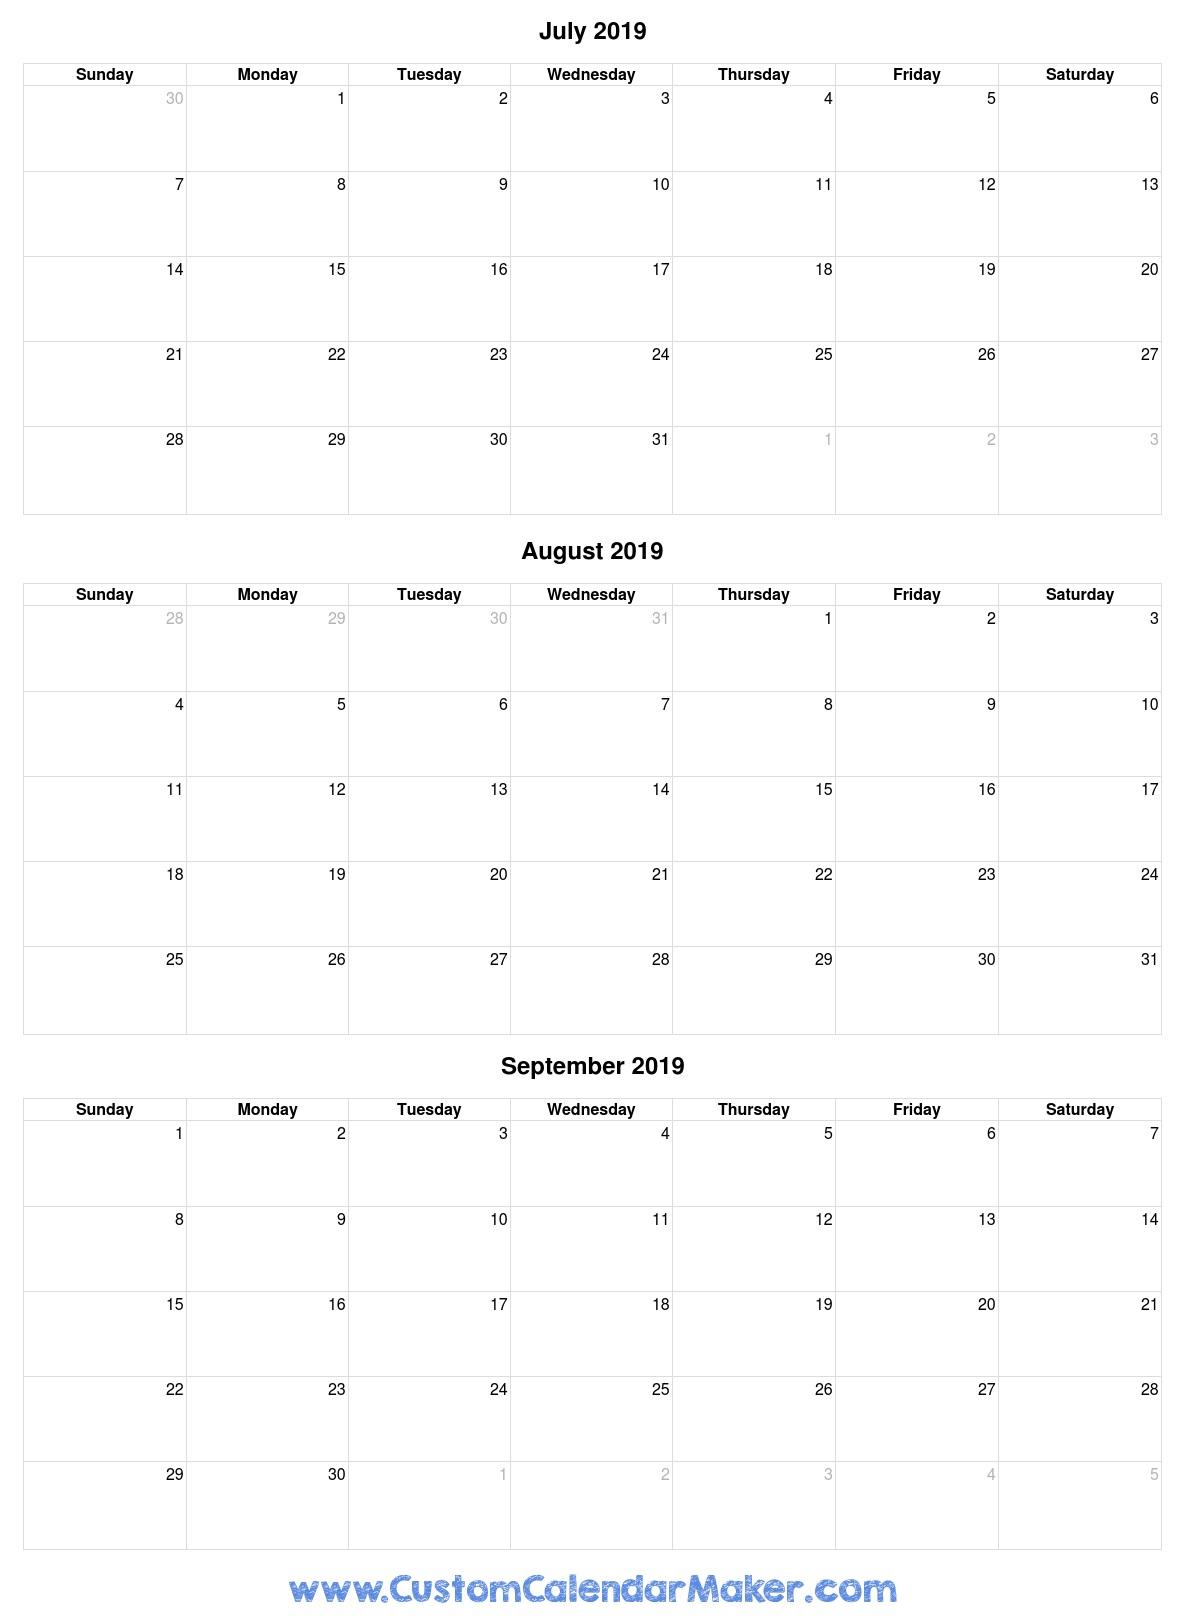 July To September 2019 Calendar - Free Printable Template